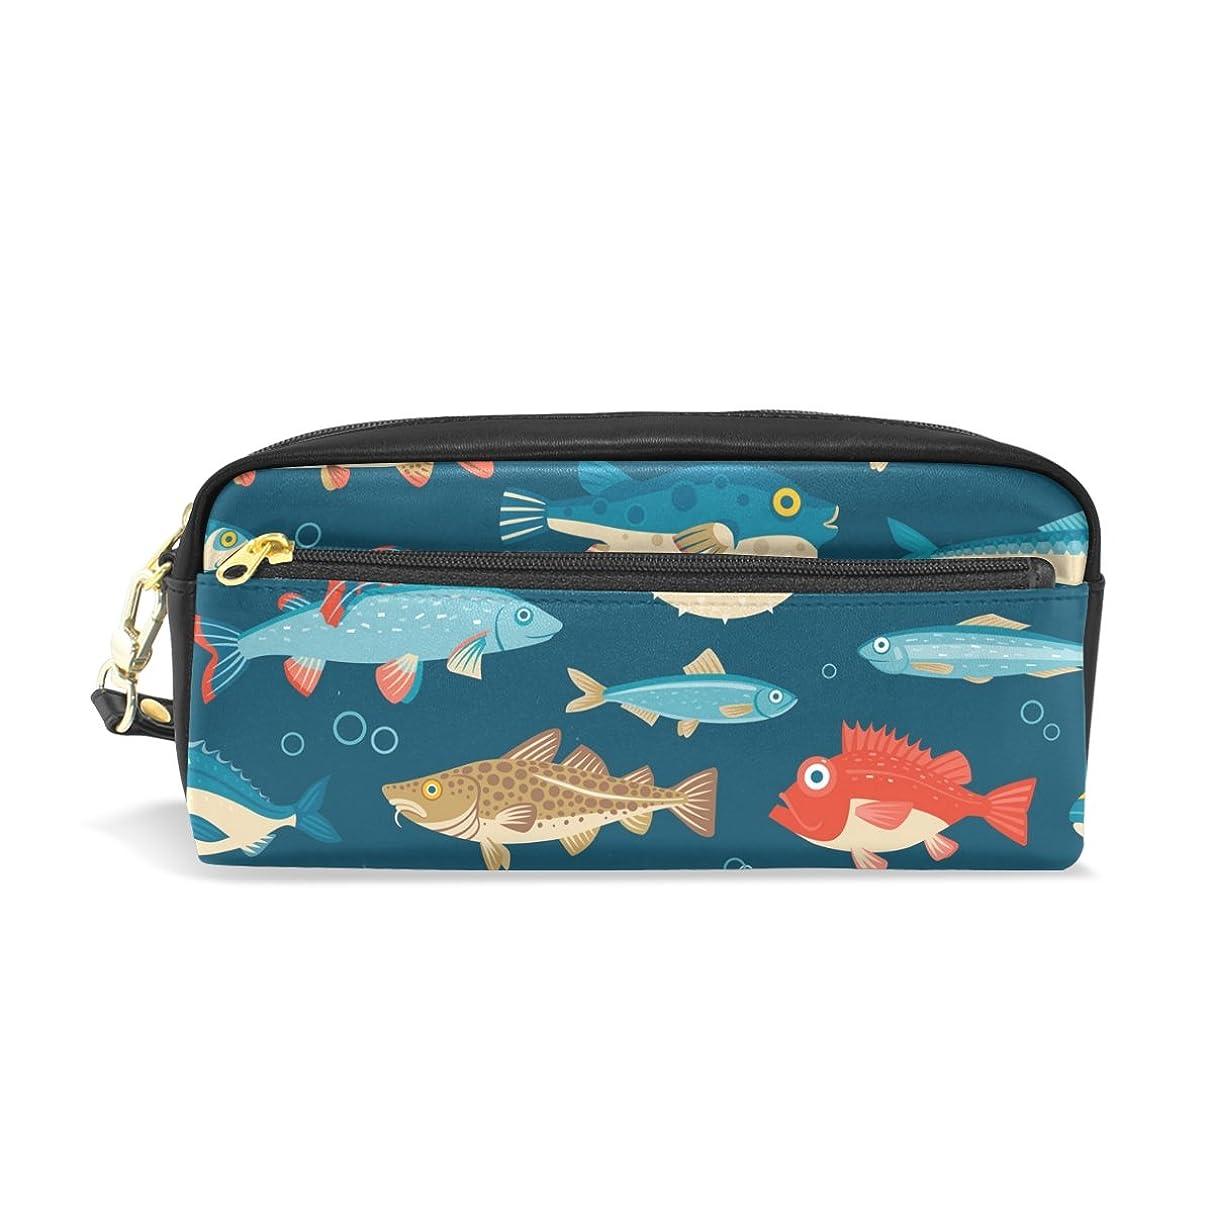 AOMOKI ペンケース 化粧ポーチ 小物入り 多機能バッグ 魚 カラフル